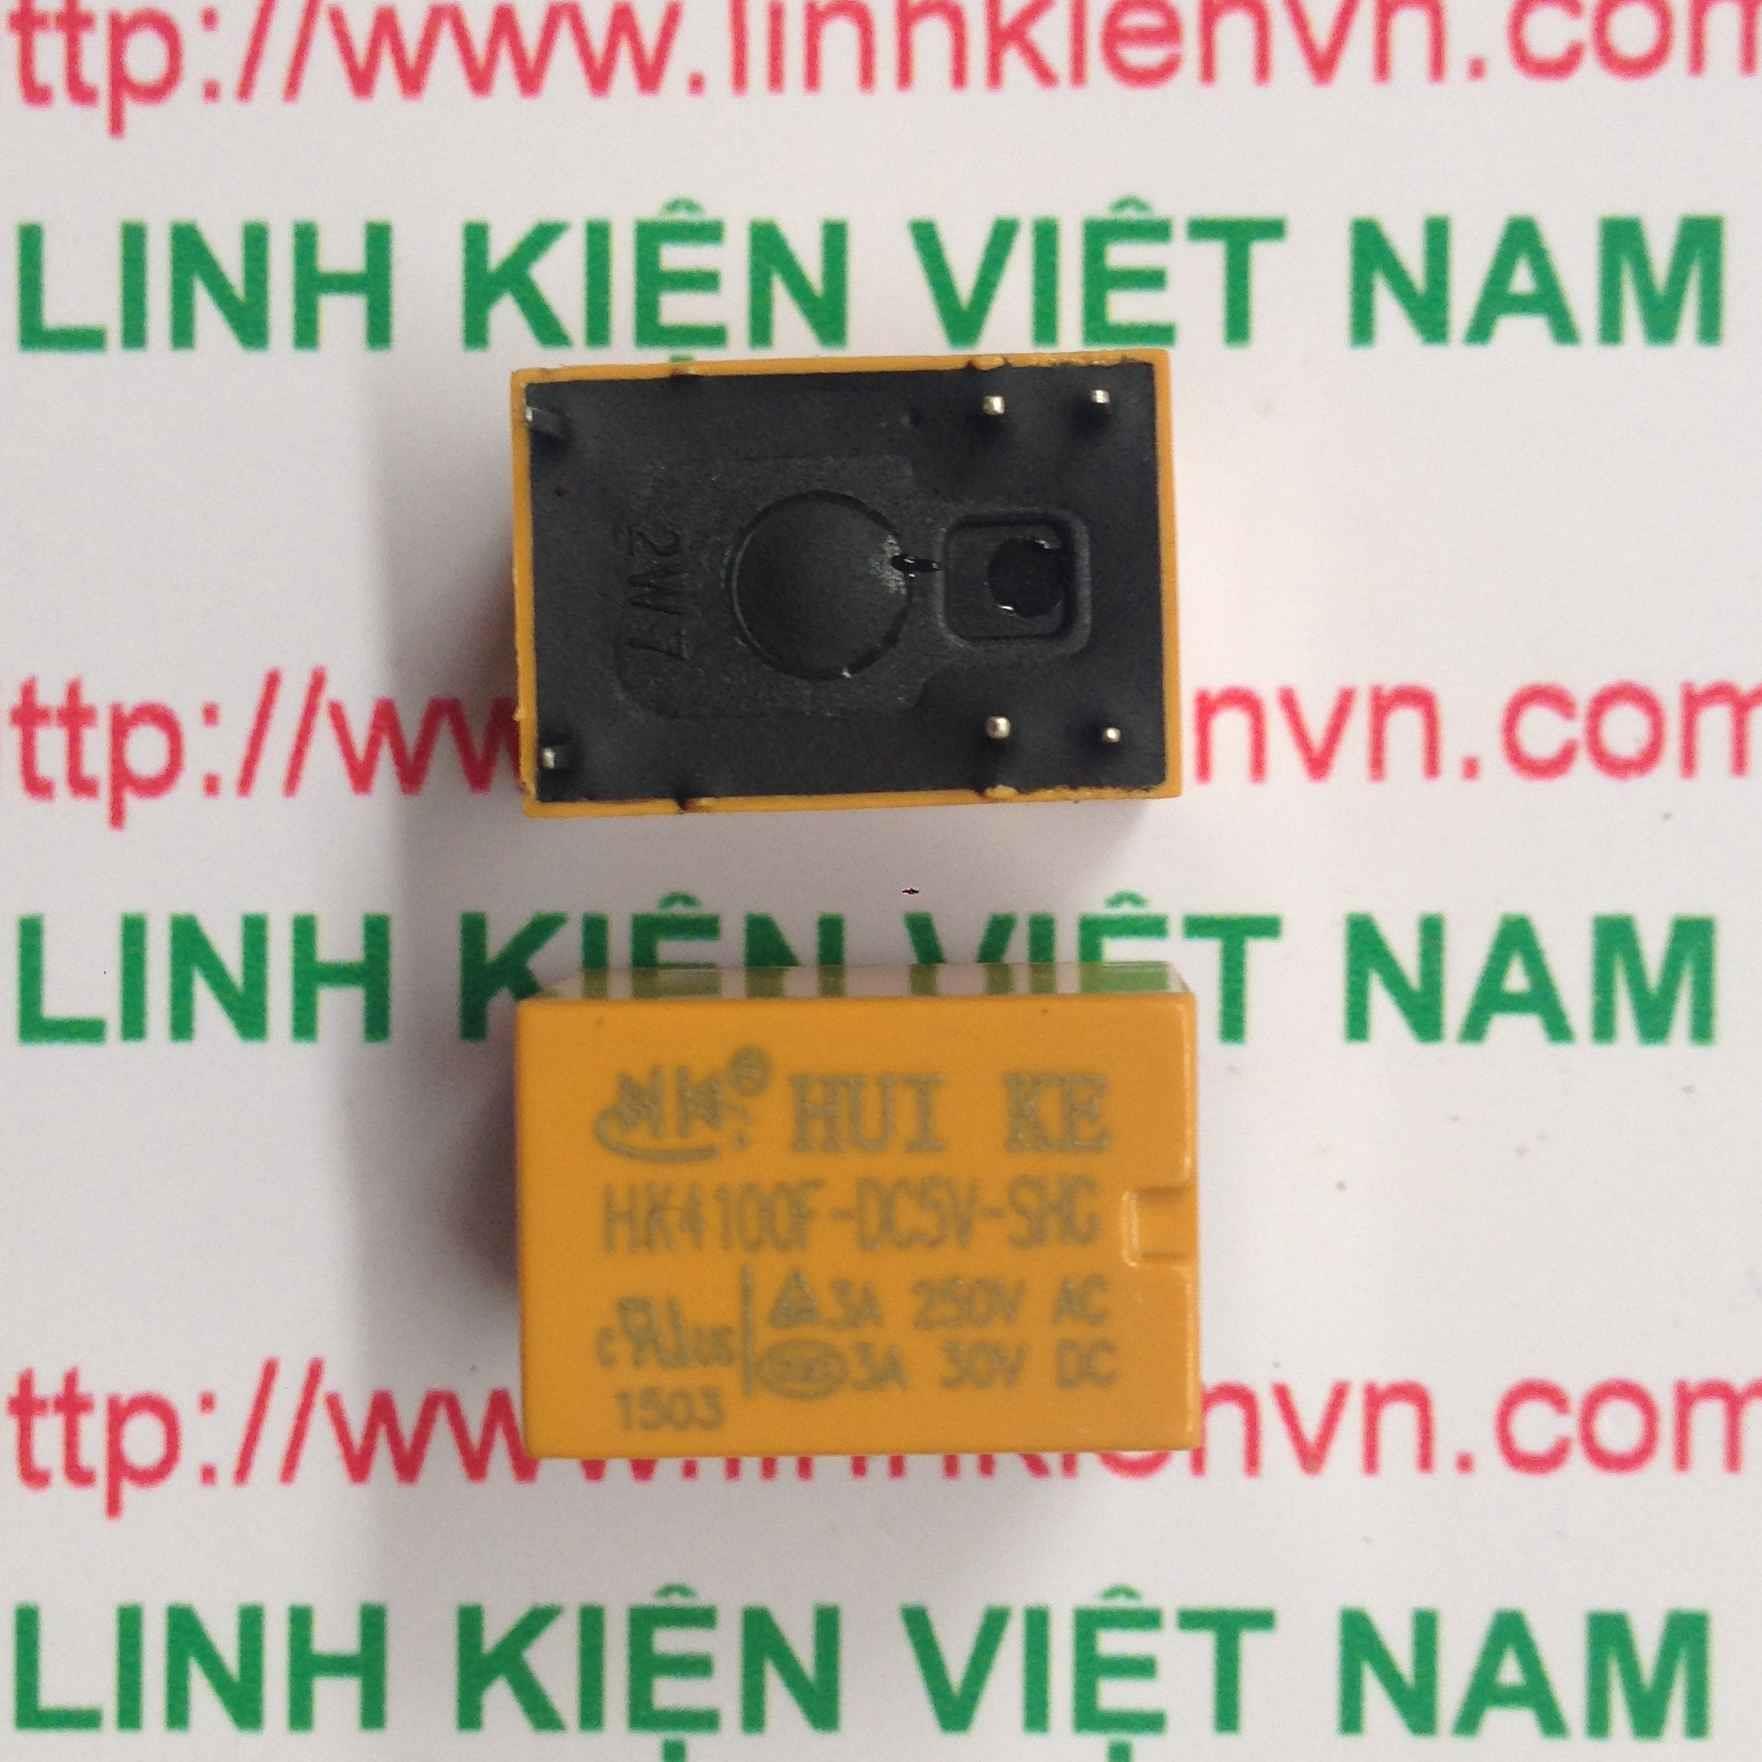 Relay Huike 1 cặp tiếp điểm 5V-3A   HK4100F-DC 5V-SHG - A1H1(KB4H3)